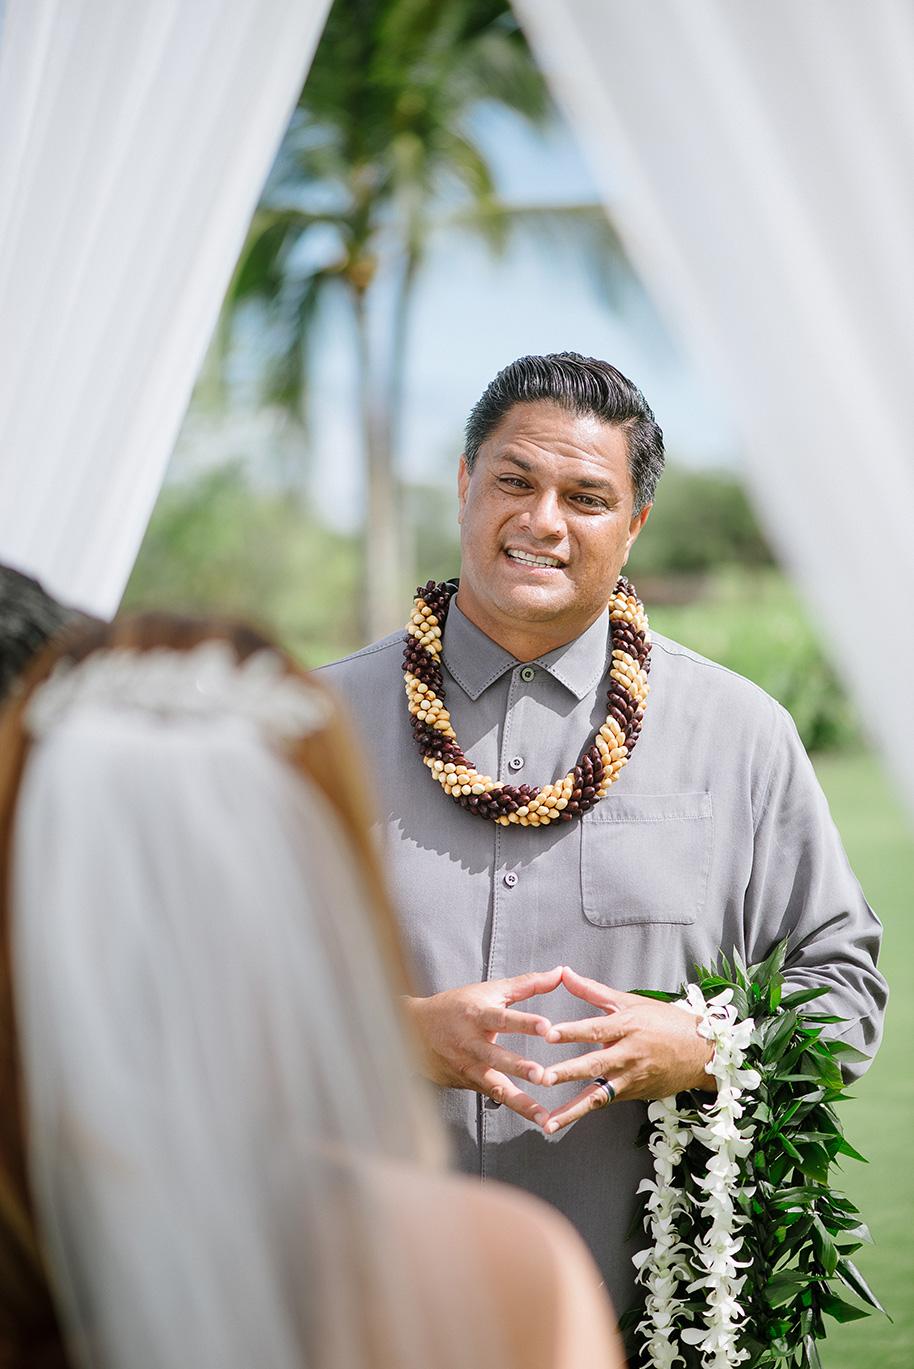 Maui-Wedding-052416-11